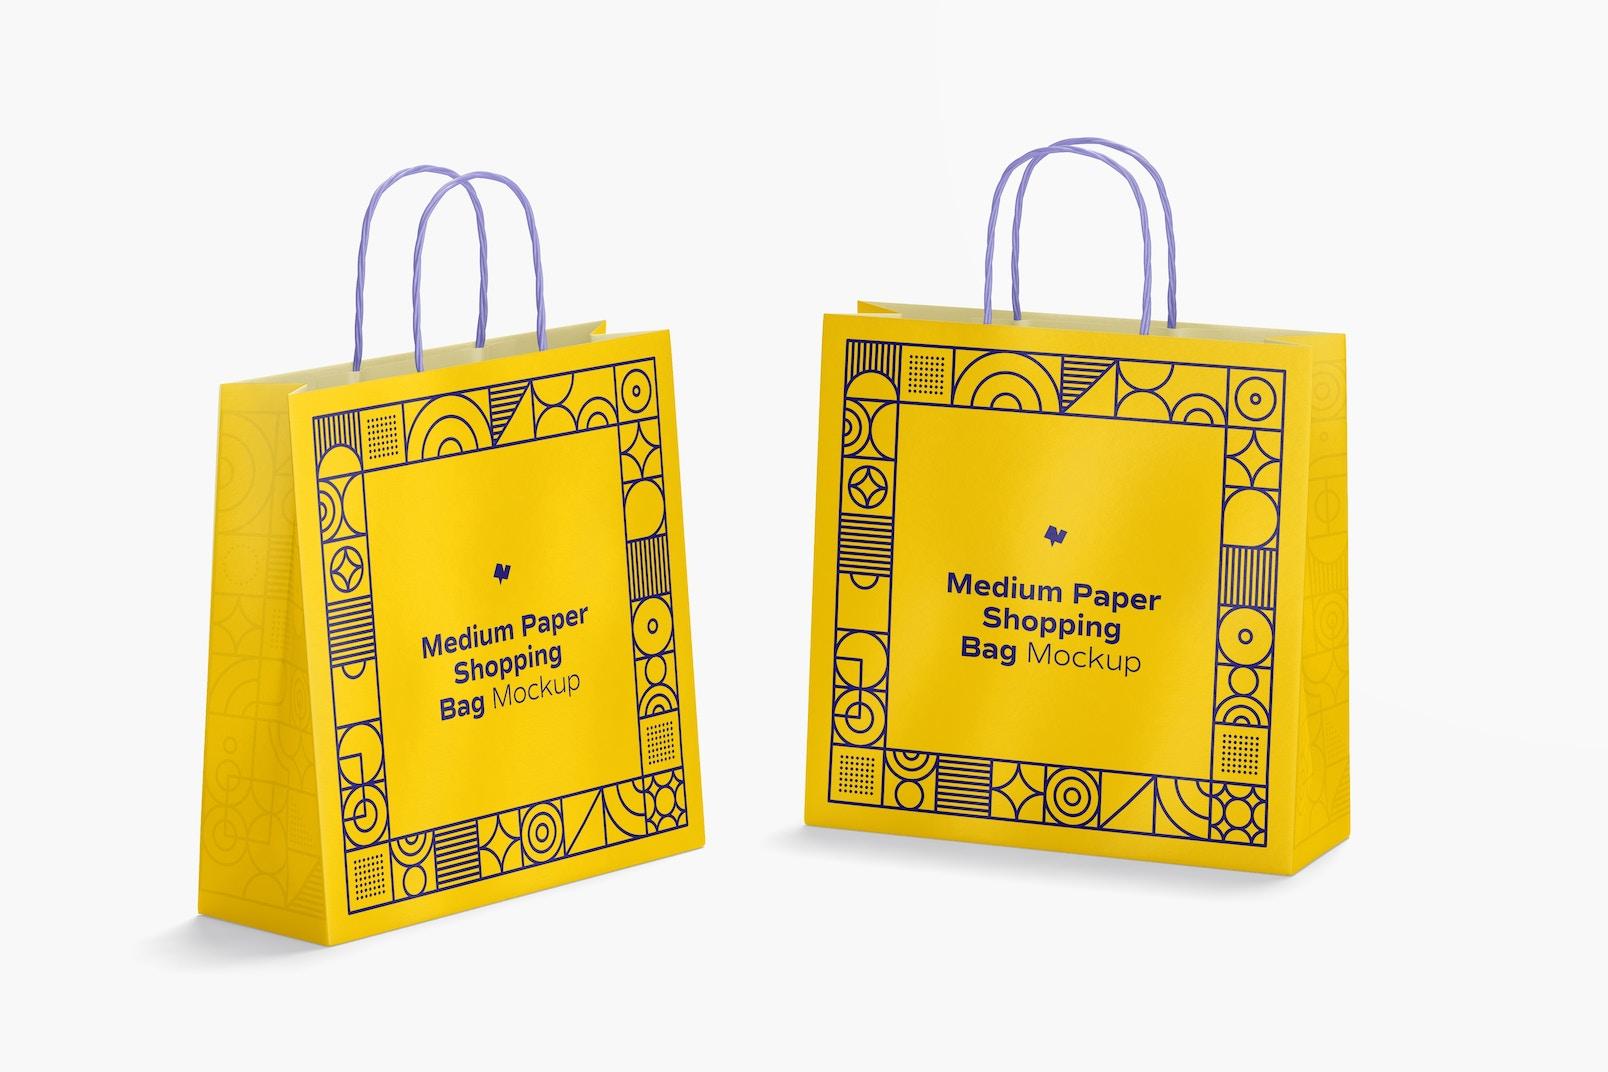 Medium Paper Shopping Bags Mockup, Perspective